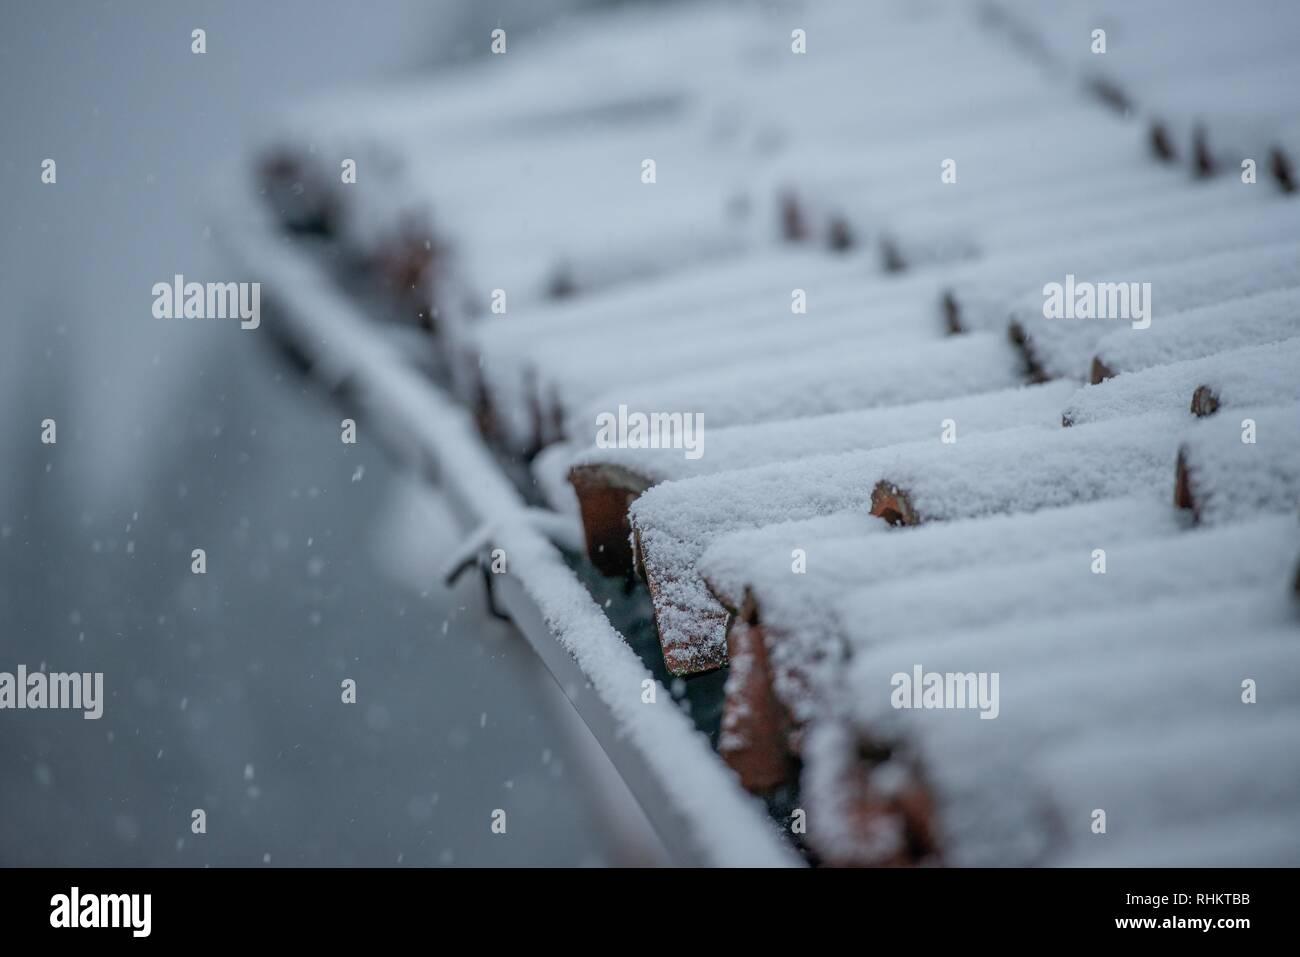 roof during an abundant snowfall - Stock Image